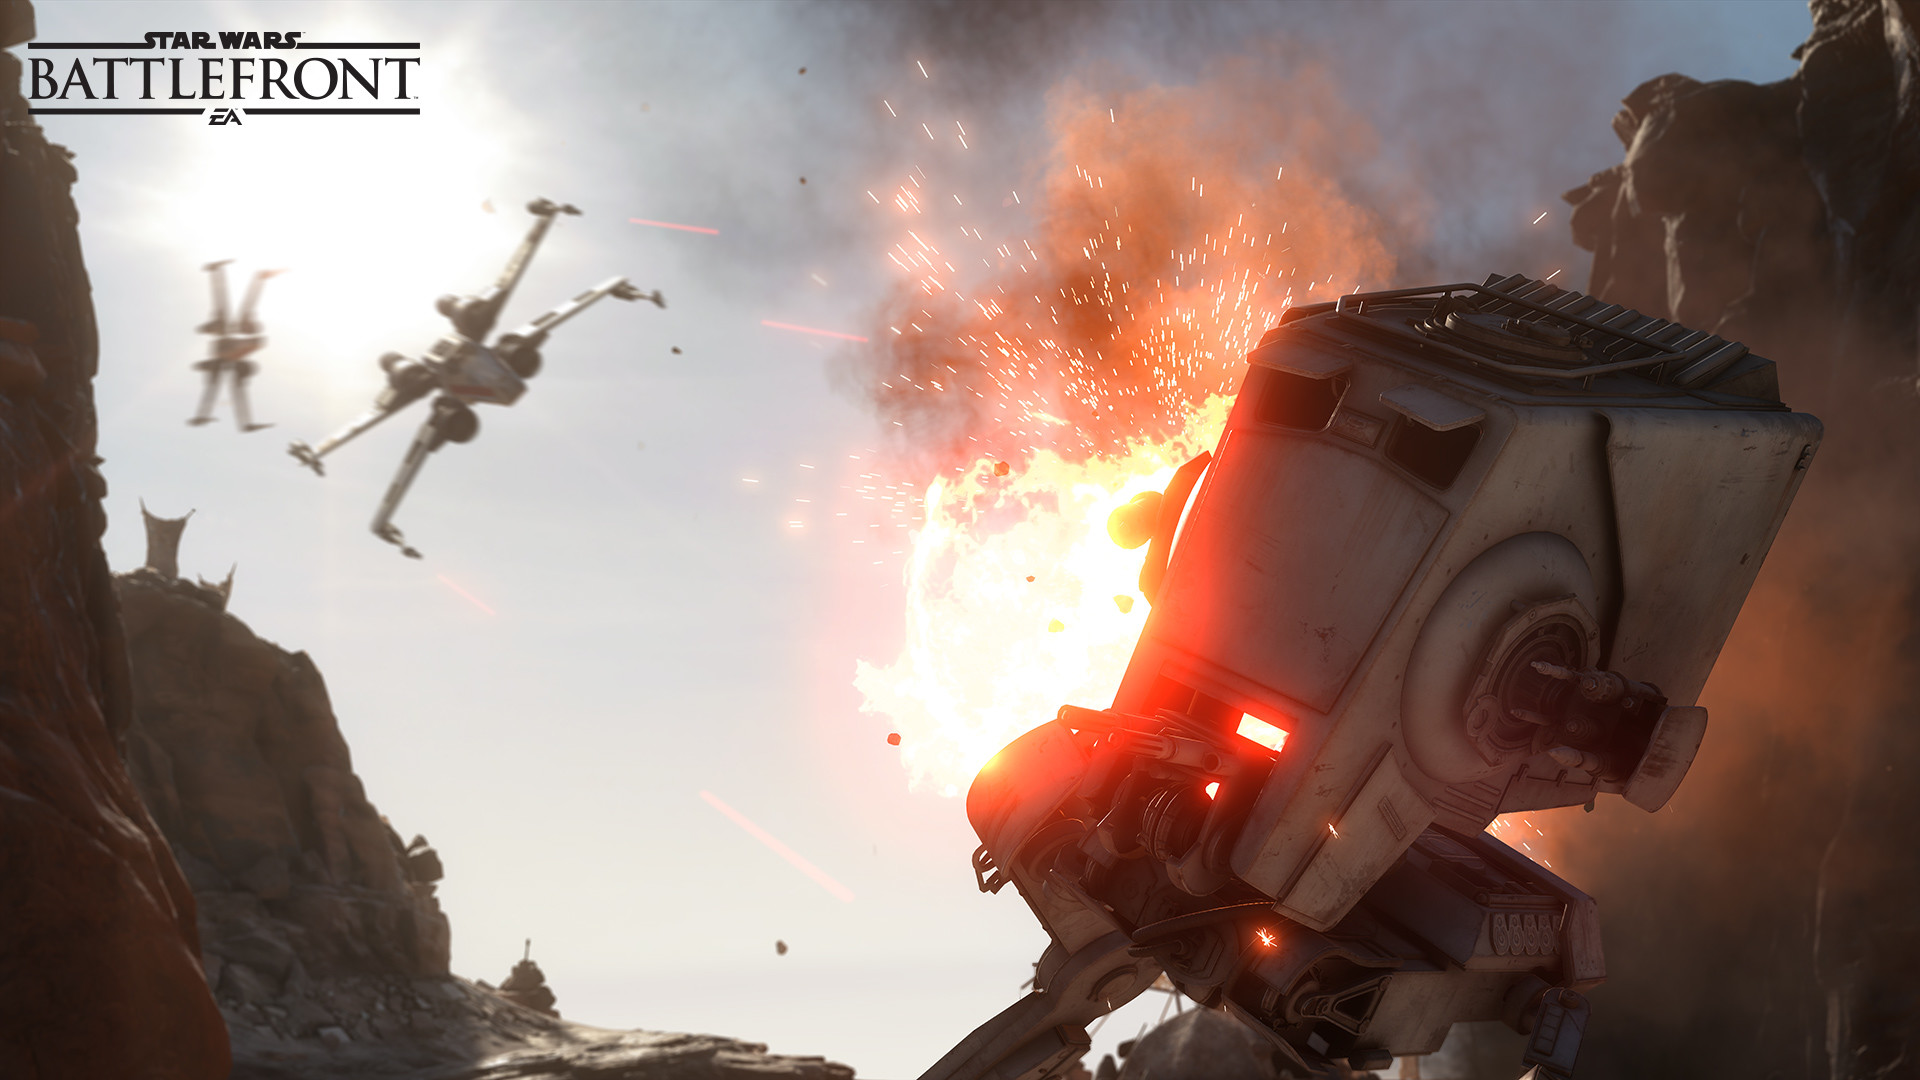 Star Wars Battlefront Prioritizes Frame Rate Over Resolution – GameSpot